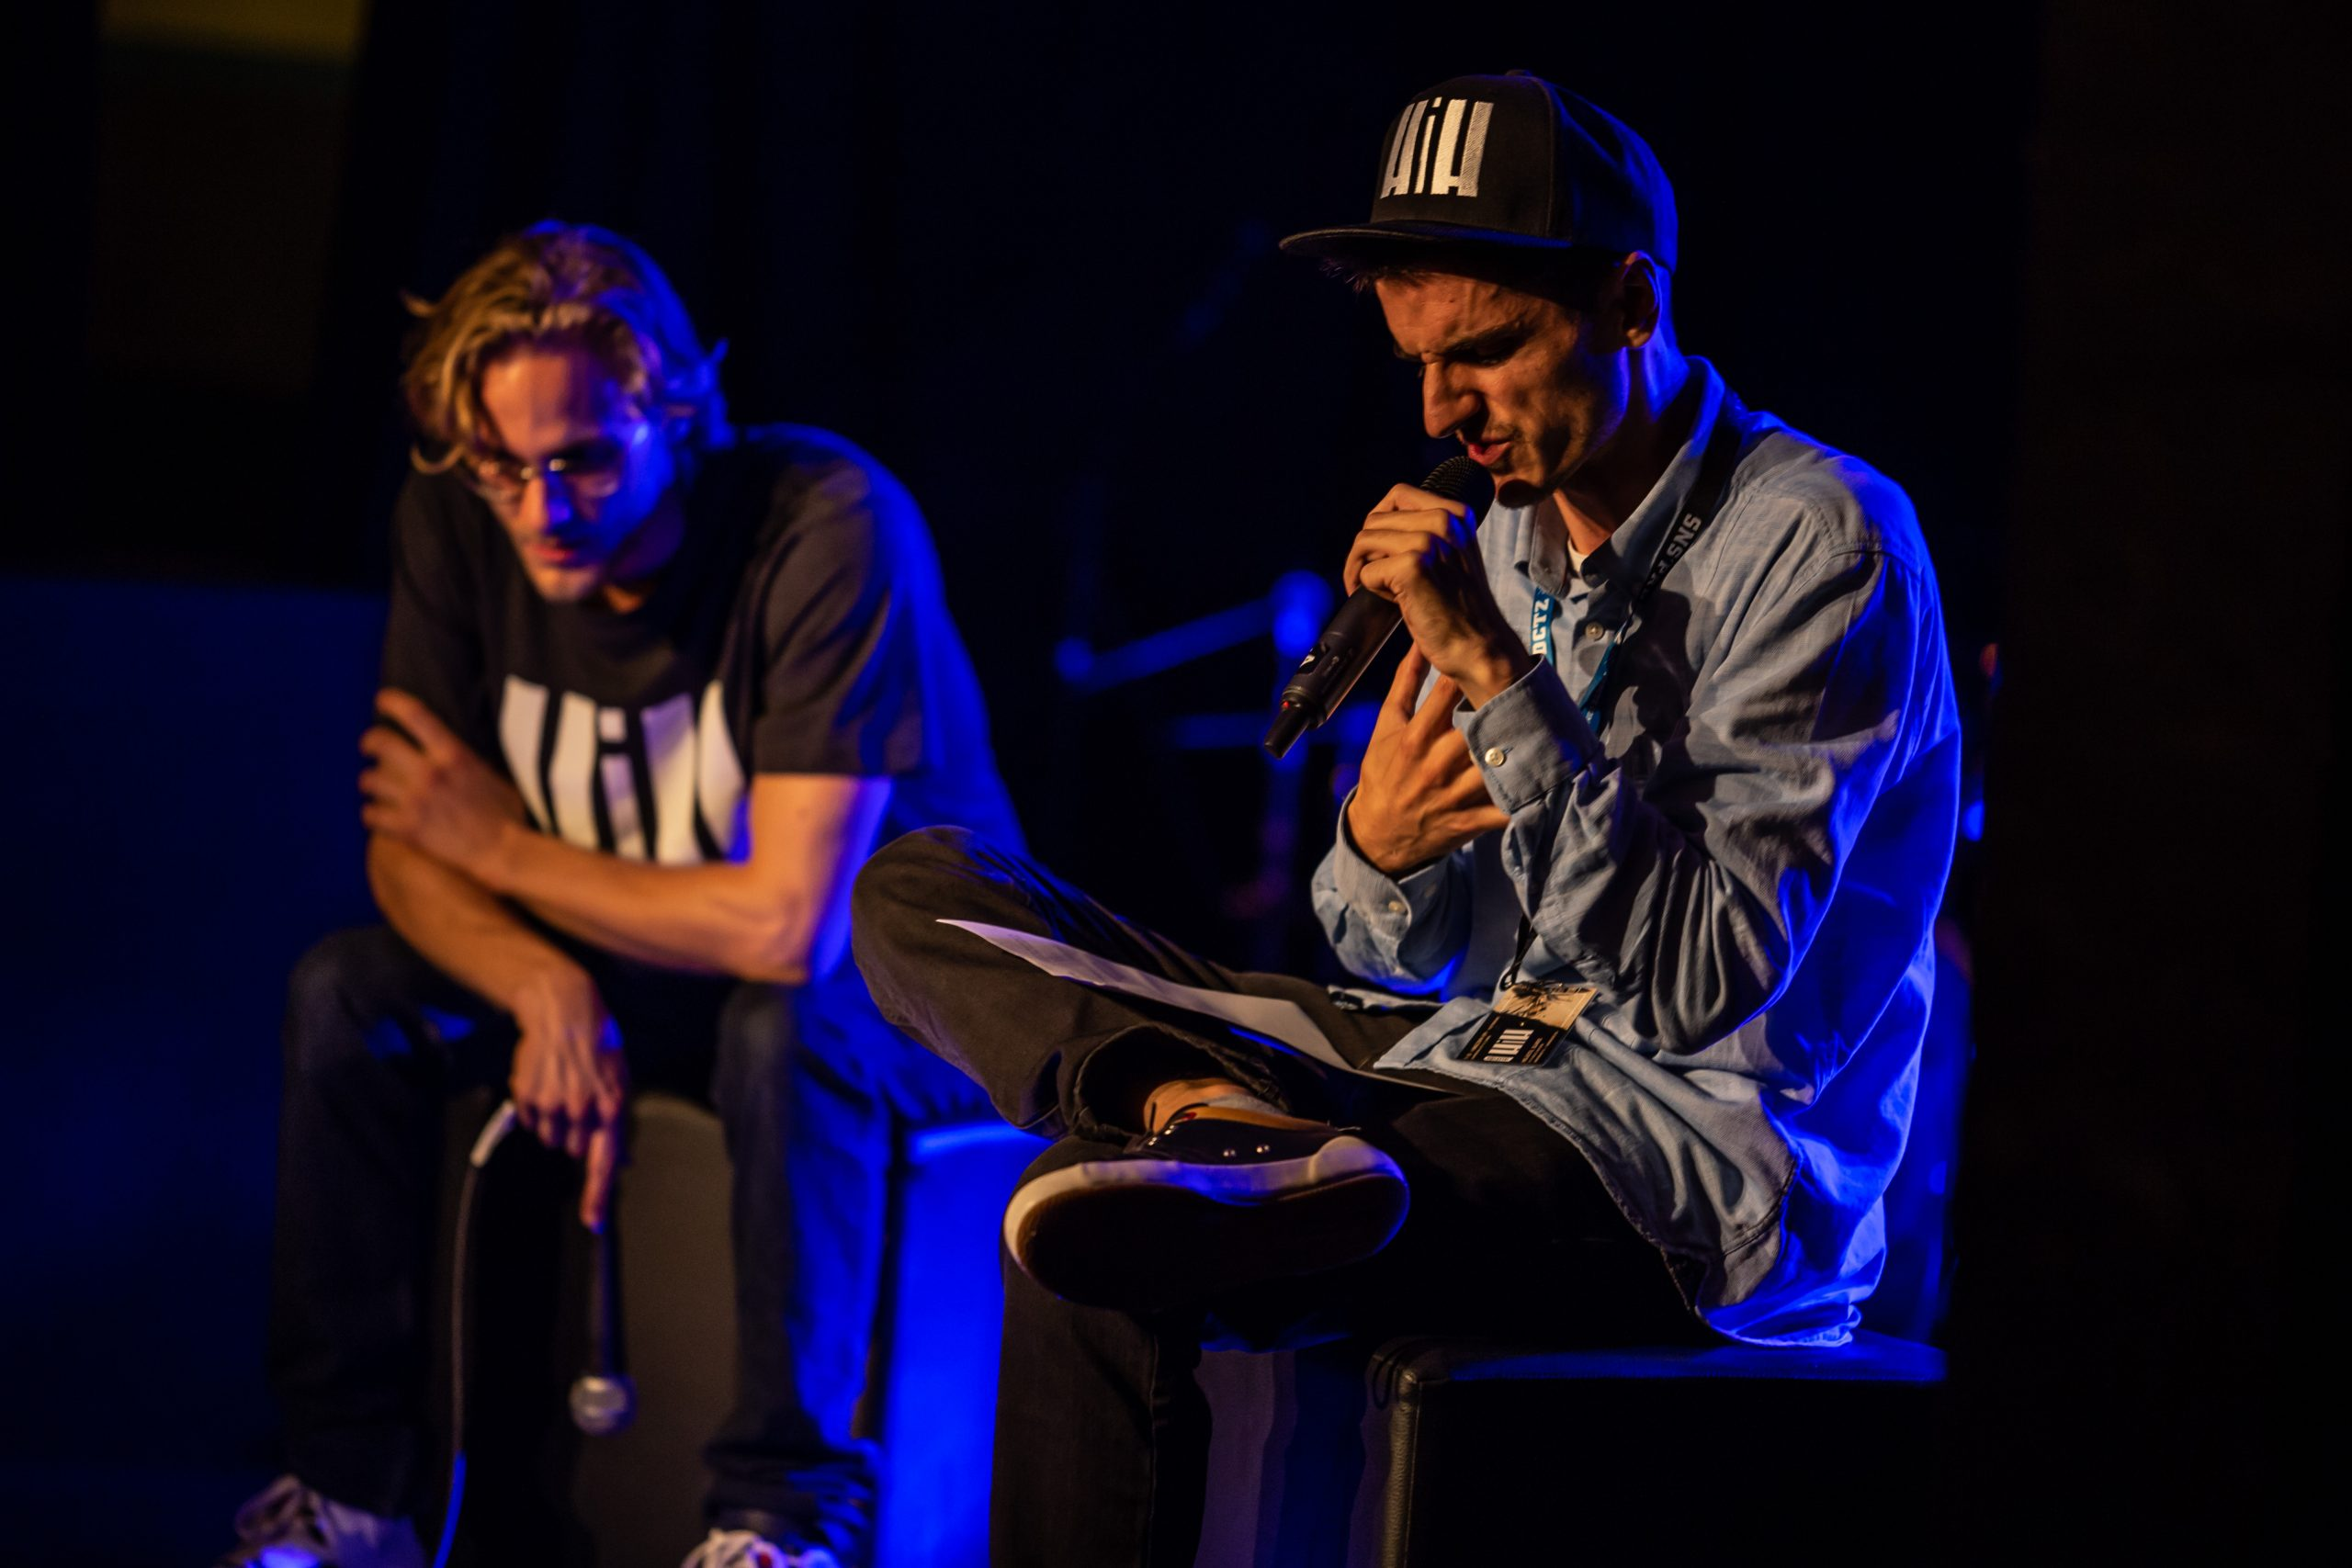 Man sitting on ottoman holding microphone